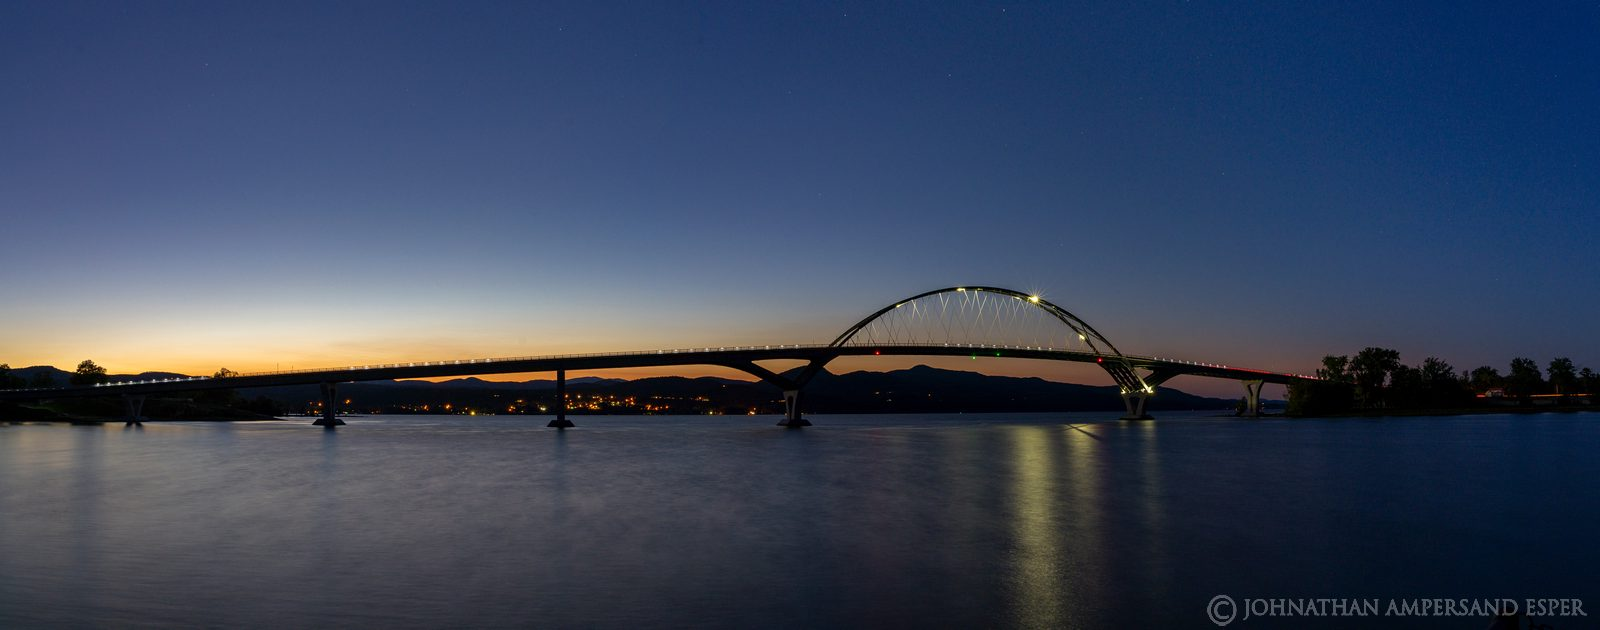 Crown Point Bridge,bridge,Lake Champlain,2020,twilight,